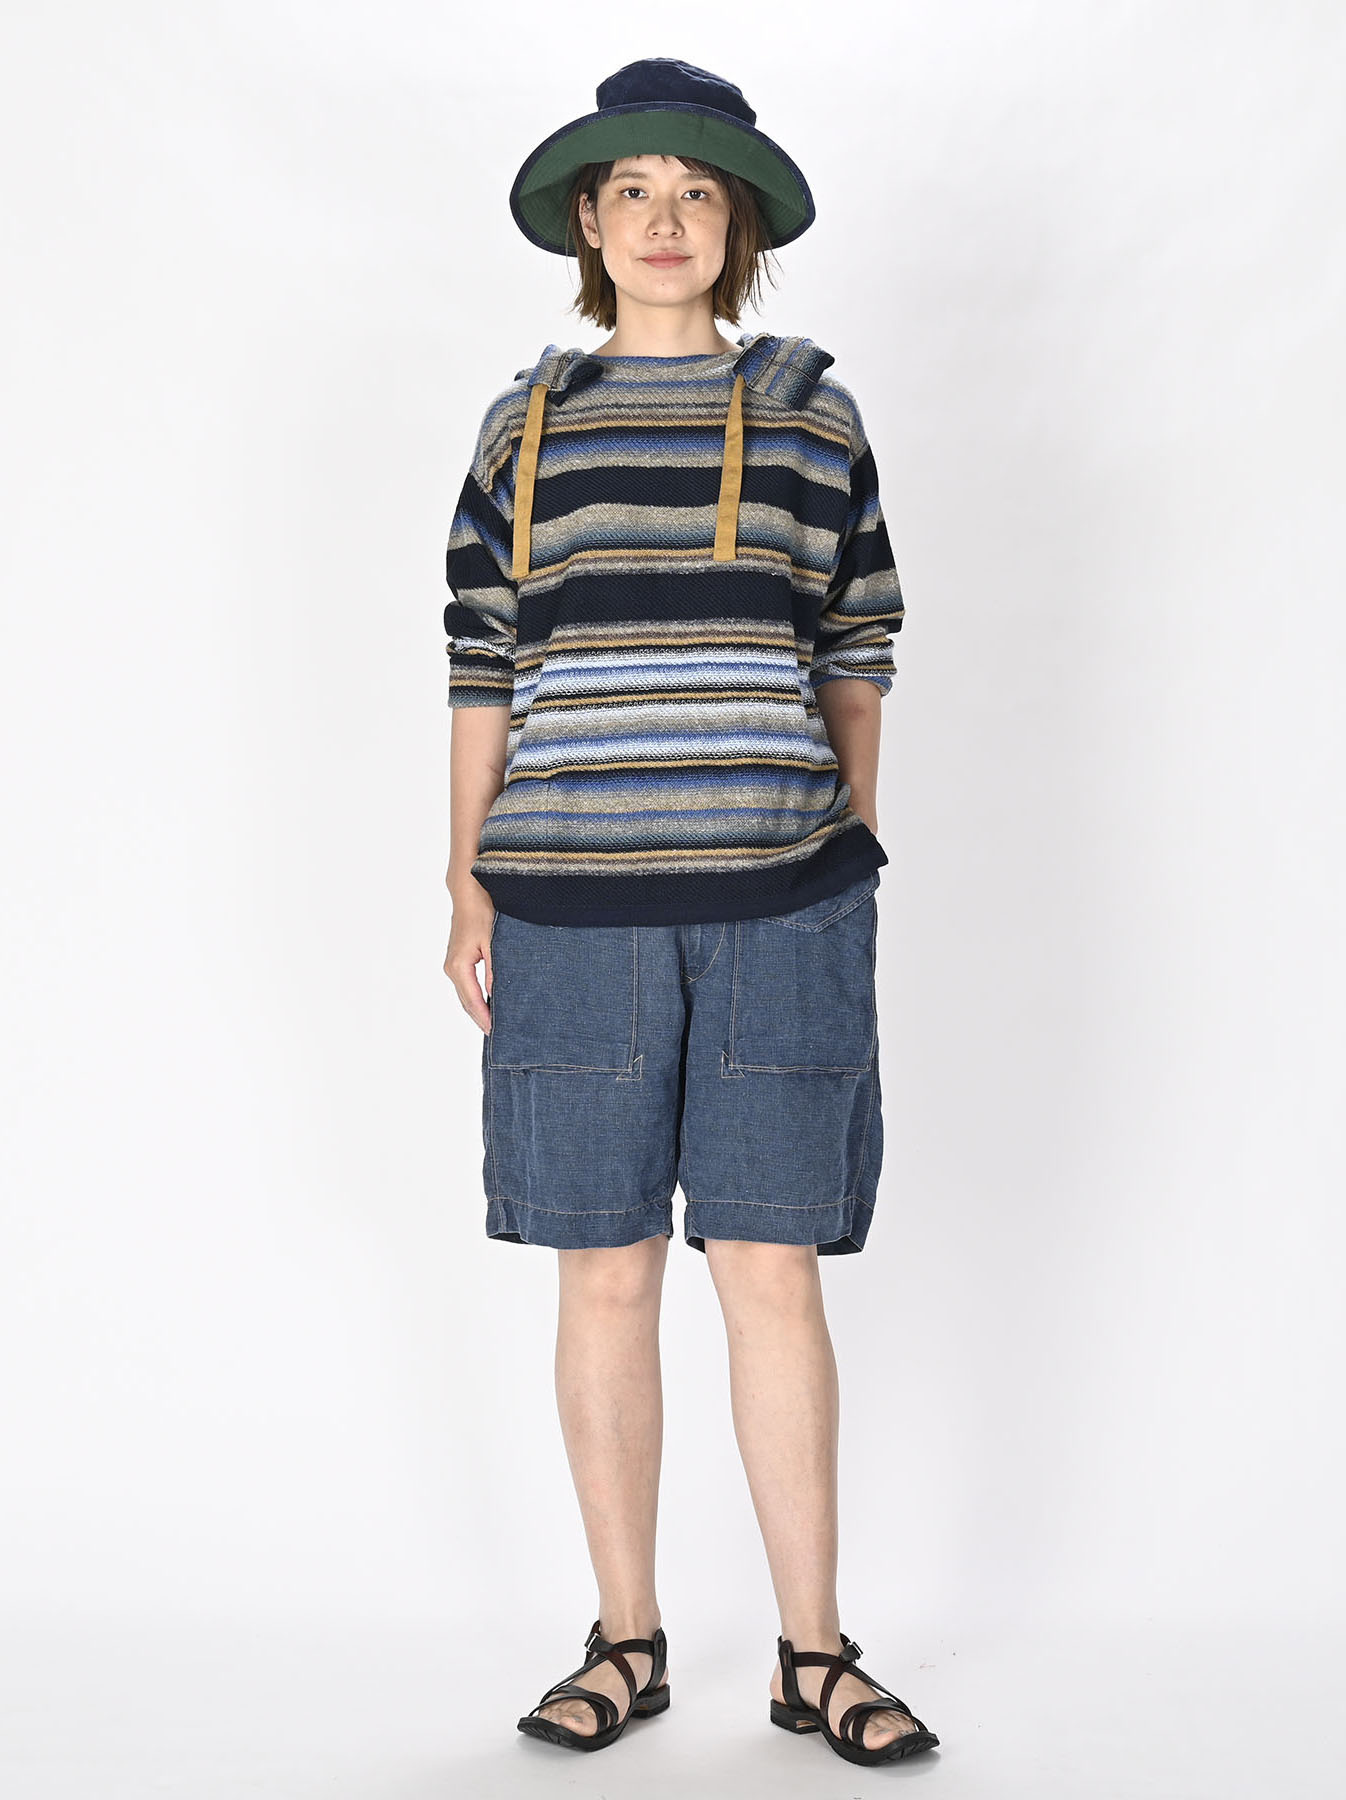 Indigo Rainbow Stripe Knit-sew 908 Umahiko Hoodie (0721)-6